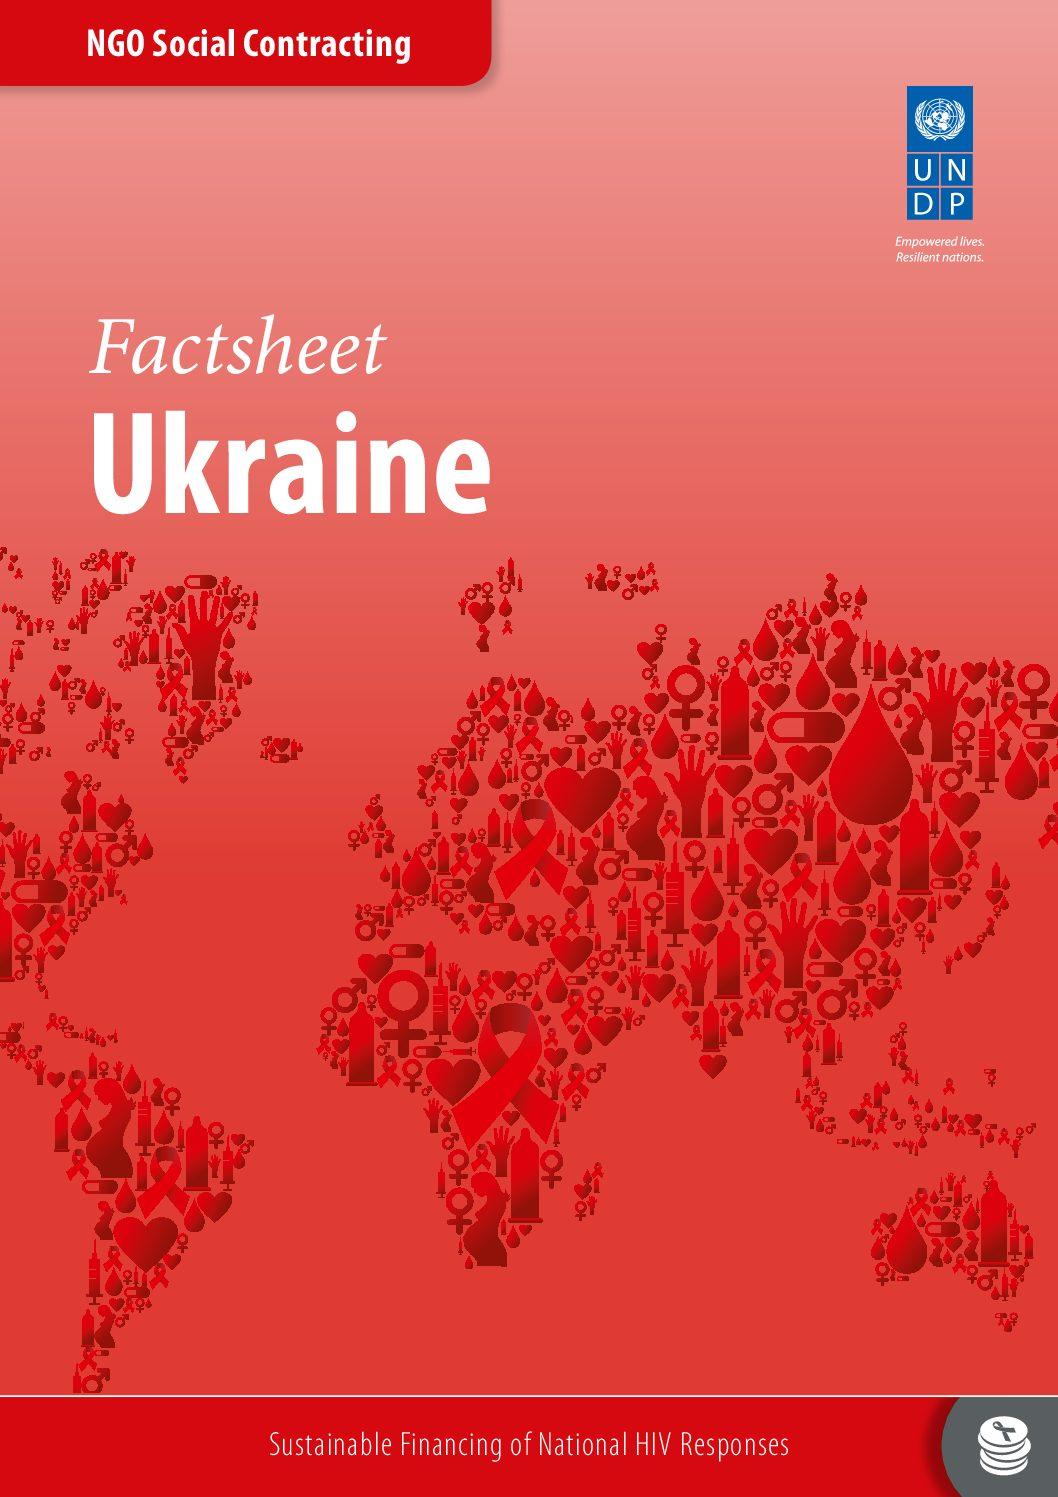 UNDP NGO factsheet Ukraine.